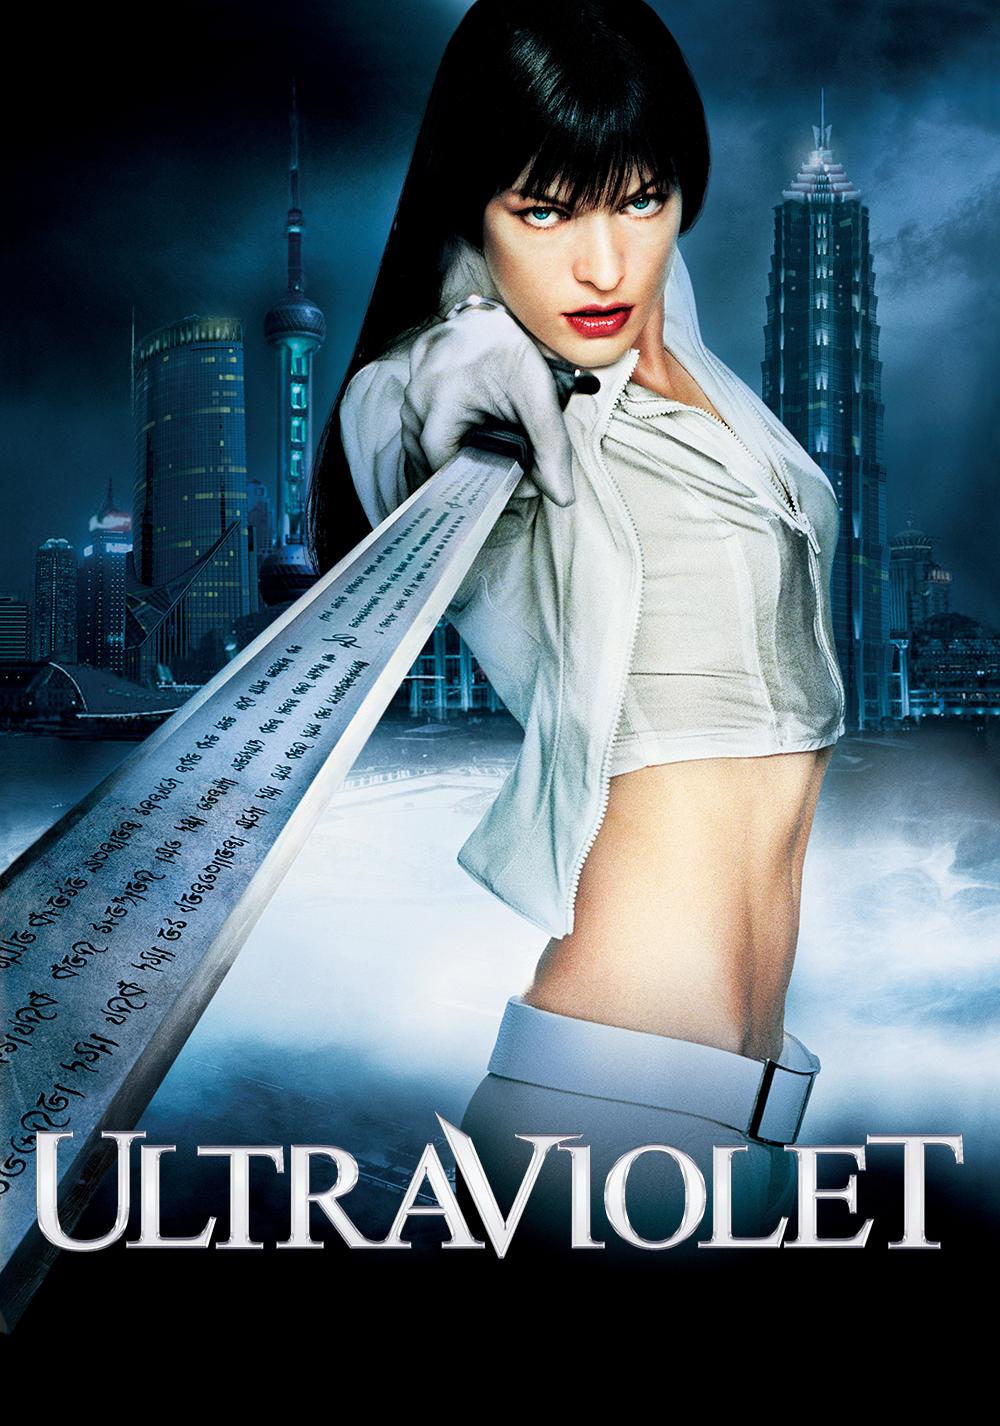 Ultraviolett Film